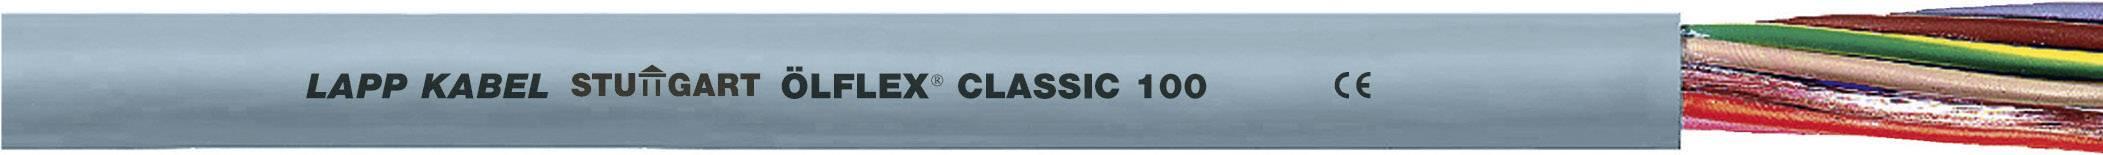 Kabel LappKabel Ölflex CLASSIC 100 5G0,5 (00100034), PVC, 6,2 mm, 500 V, šedá, 100 m